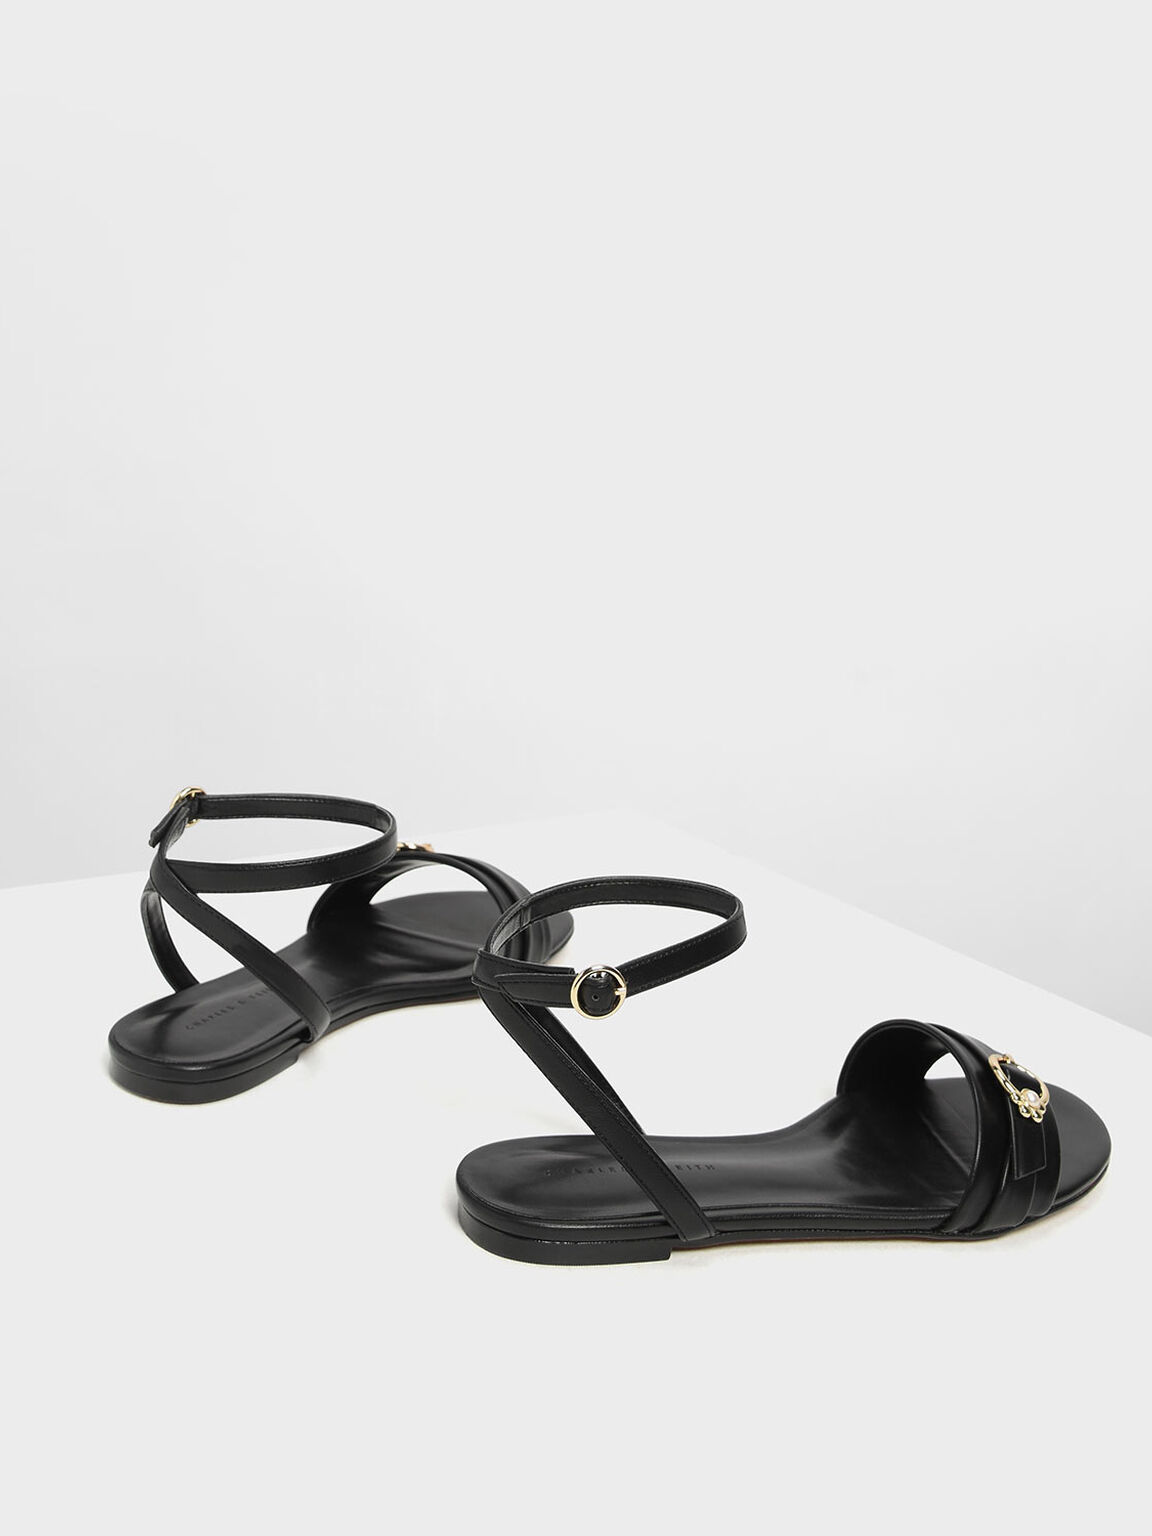 Gold Accent Ankle Strap Flats, Black, hi-res